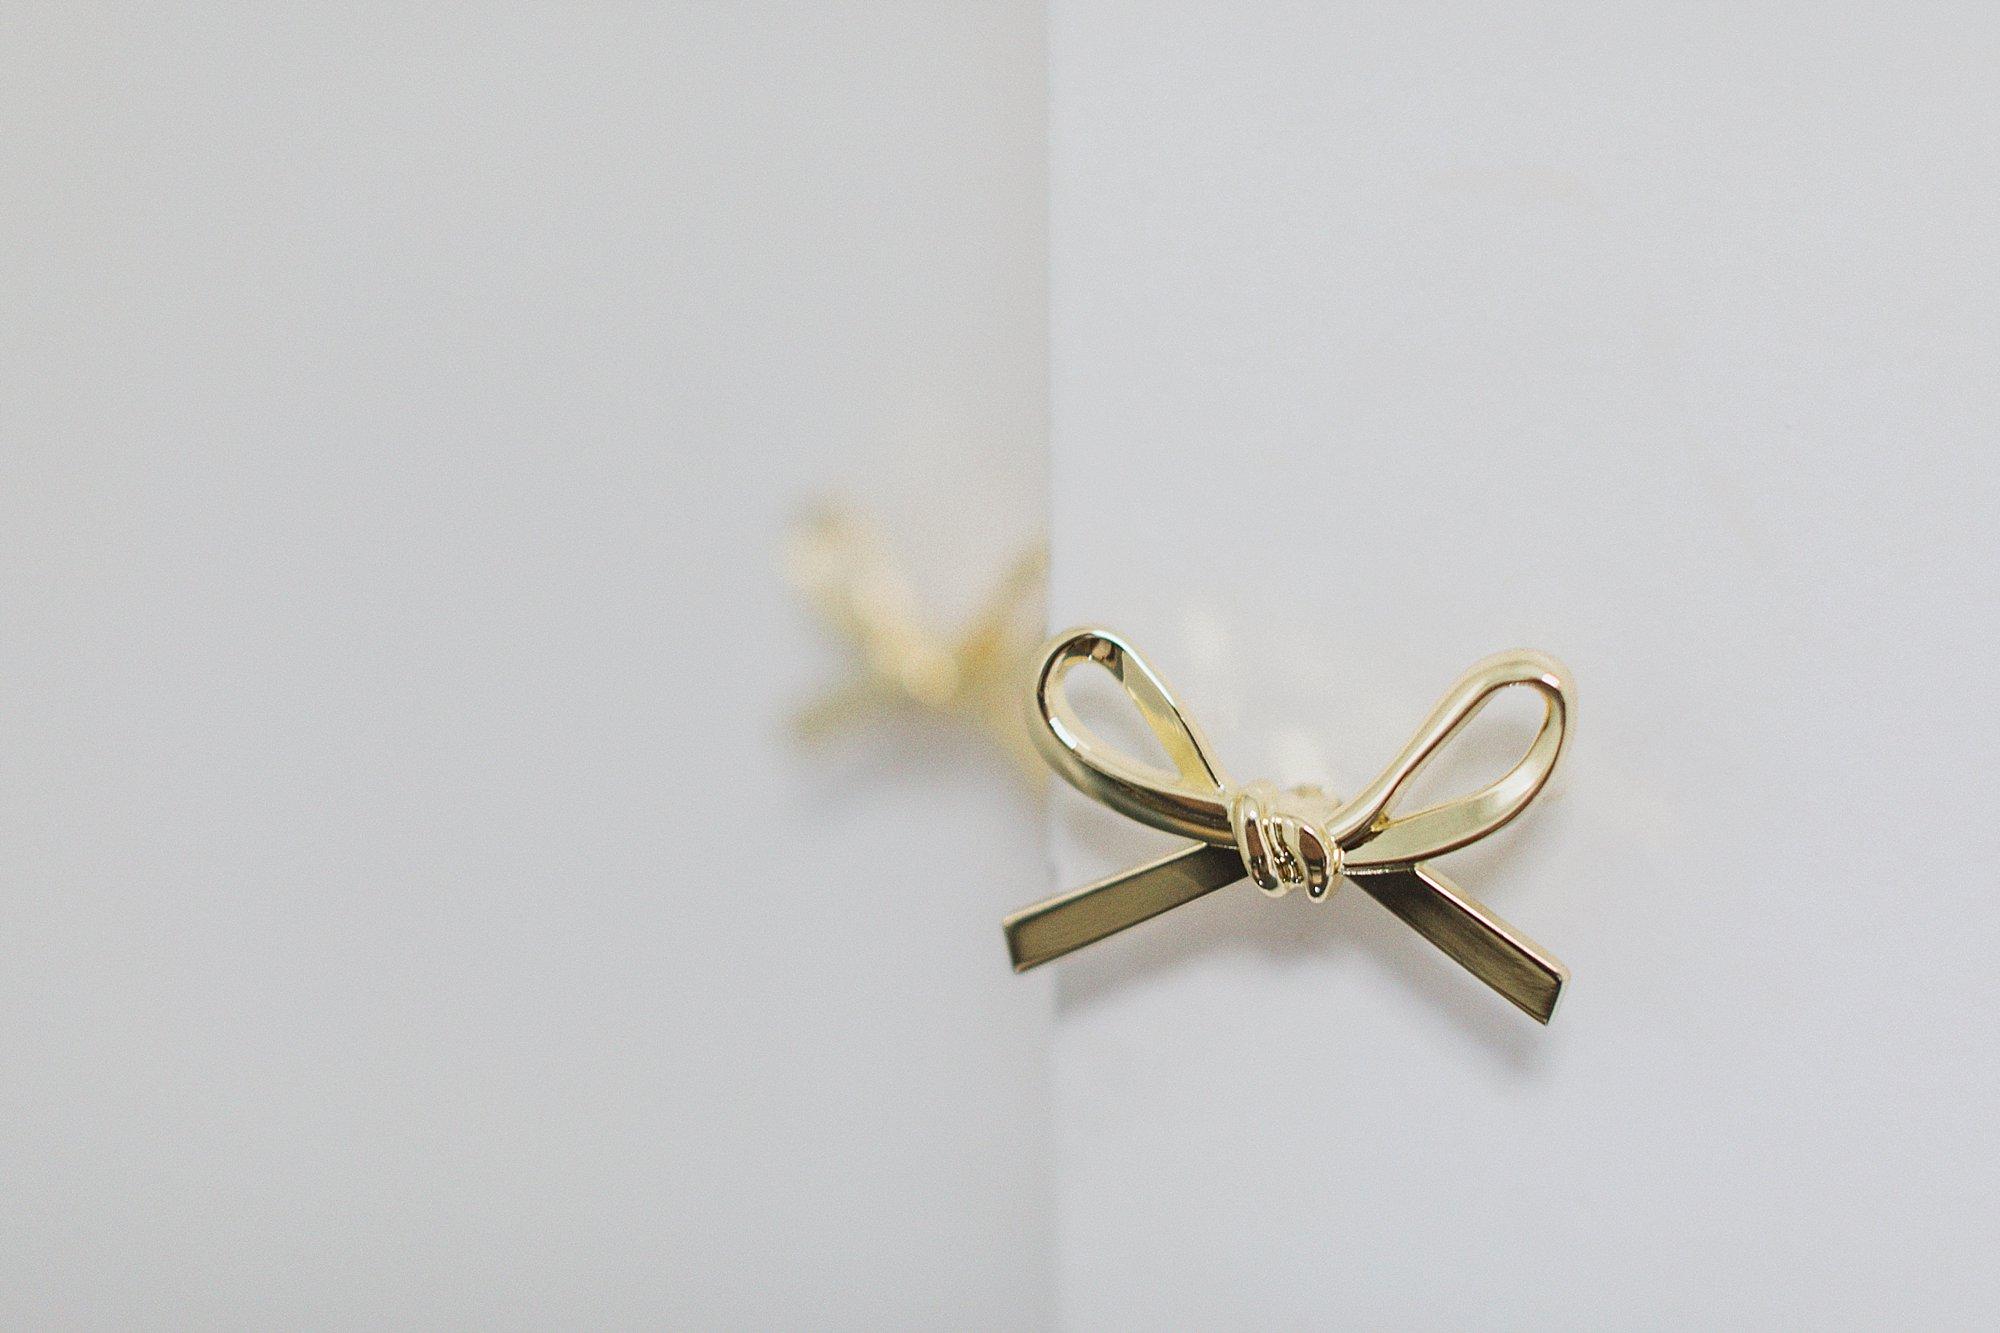 gold bow knob on closet doors